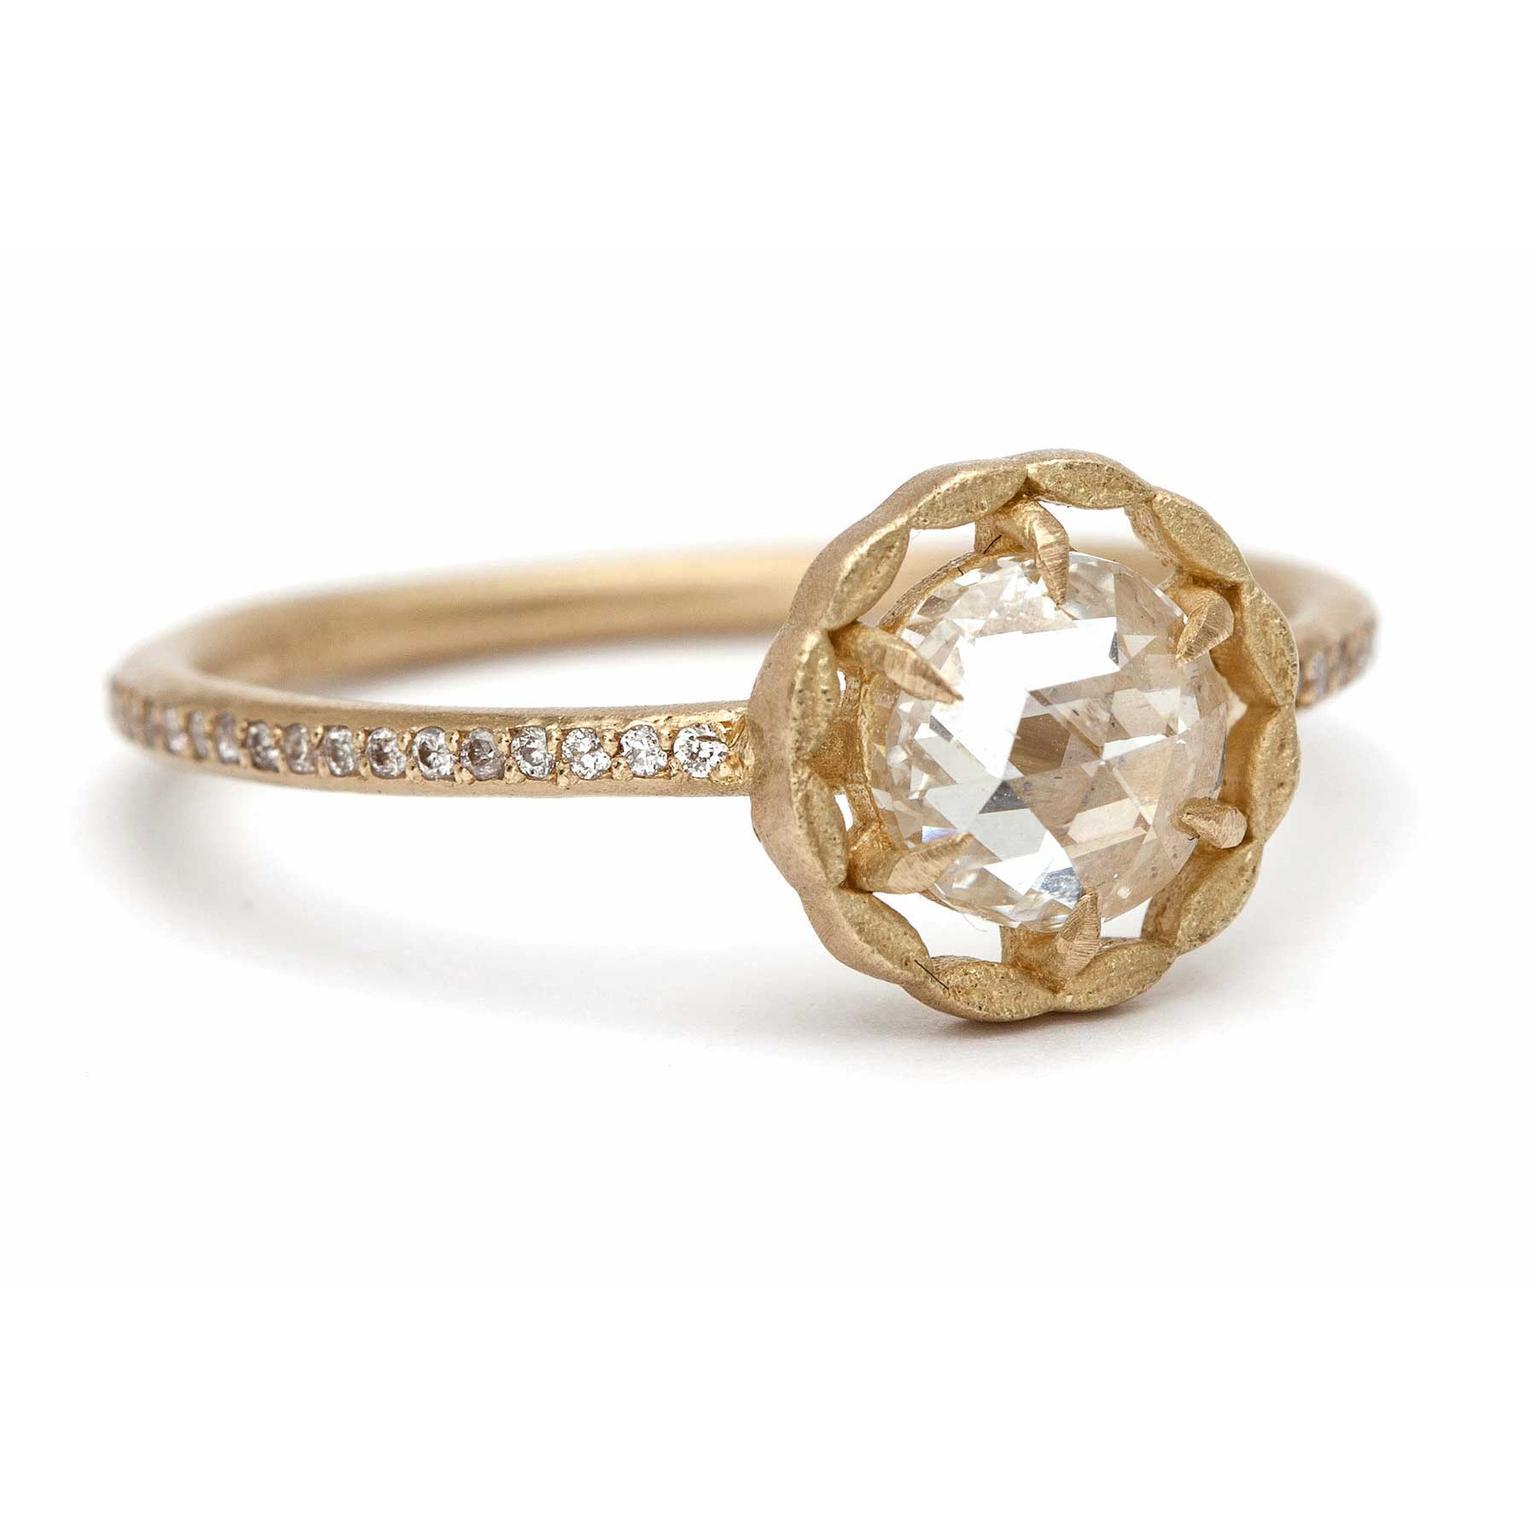 The revival of rose cut diamond engagement rings